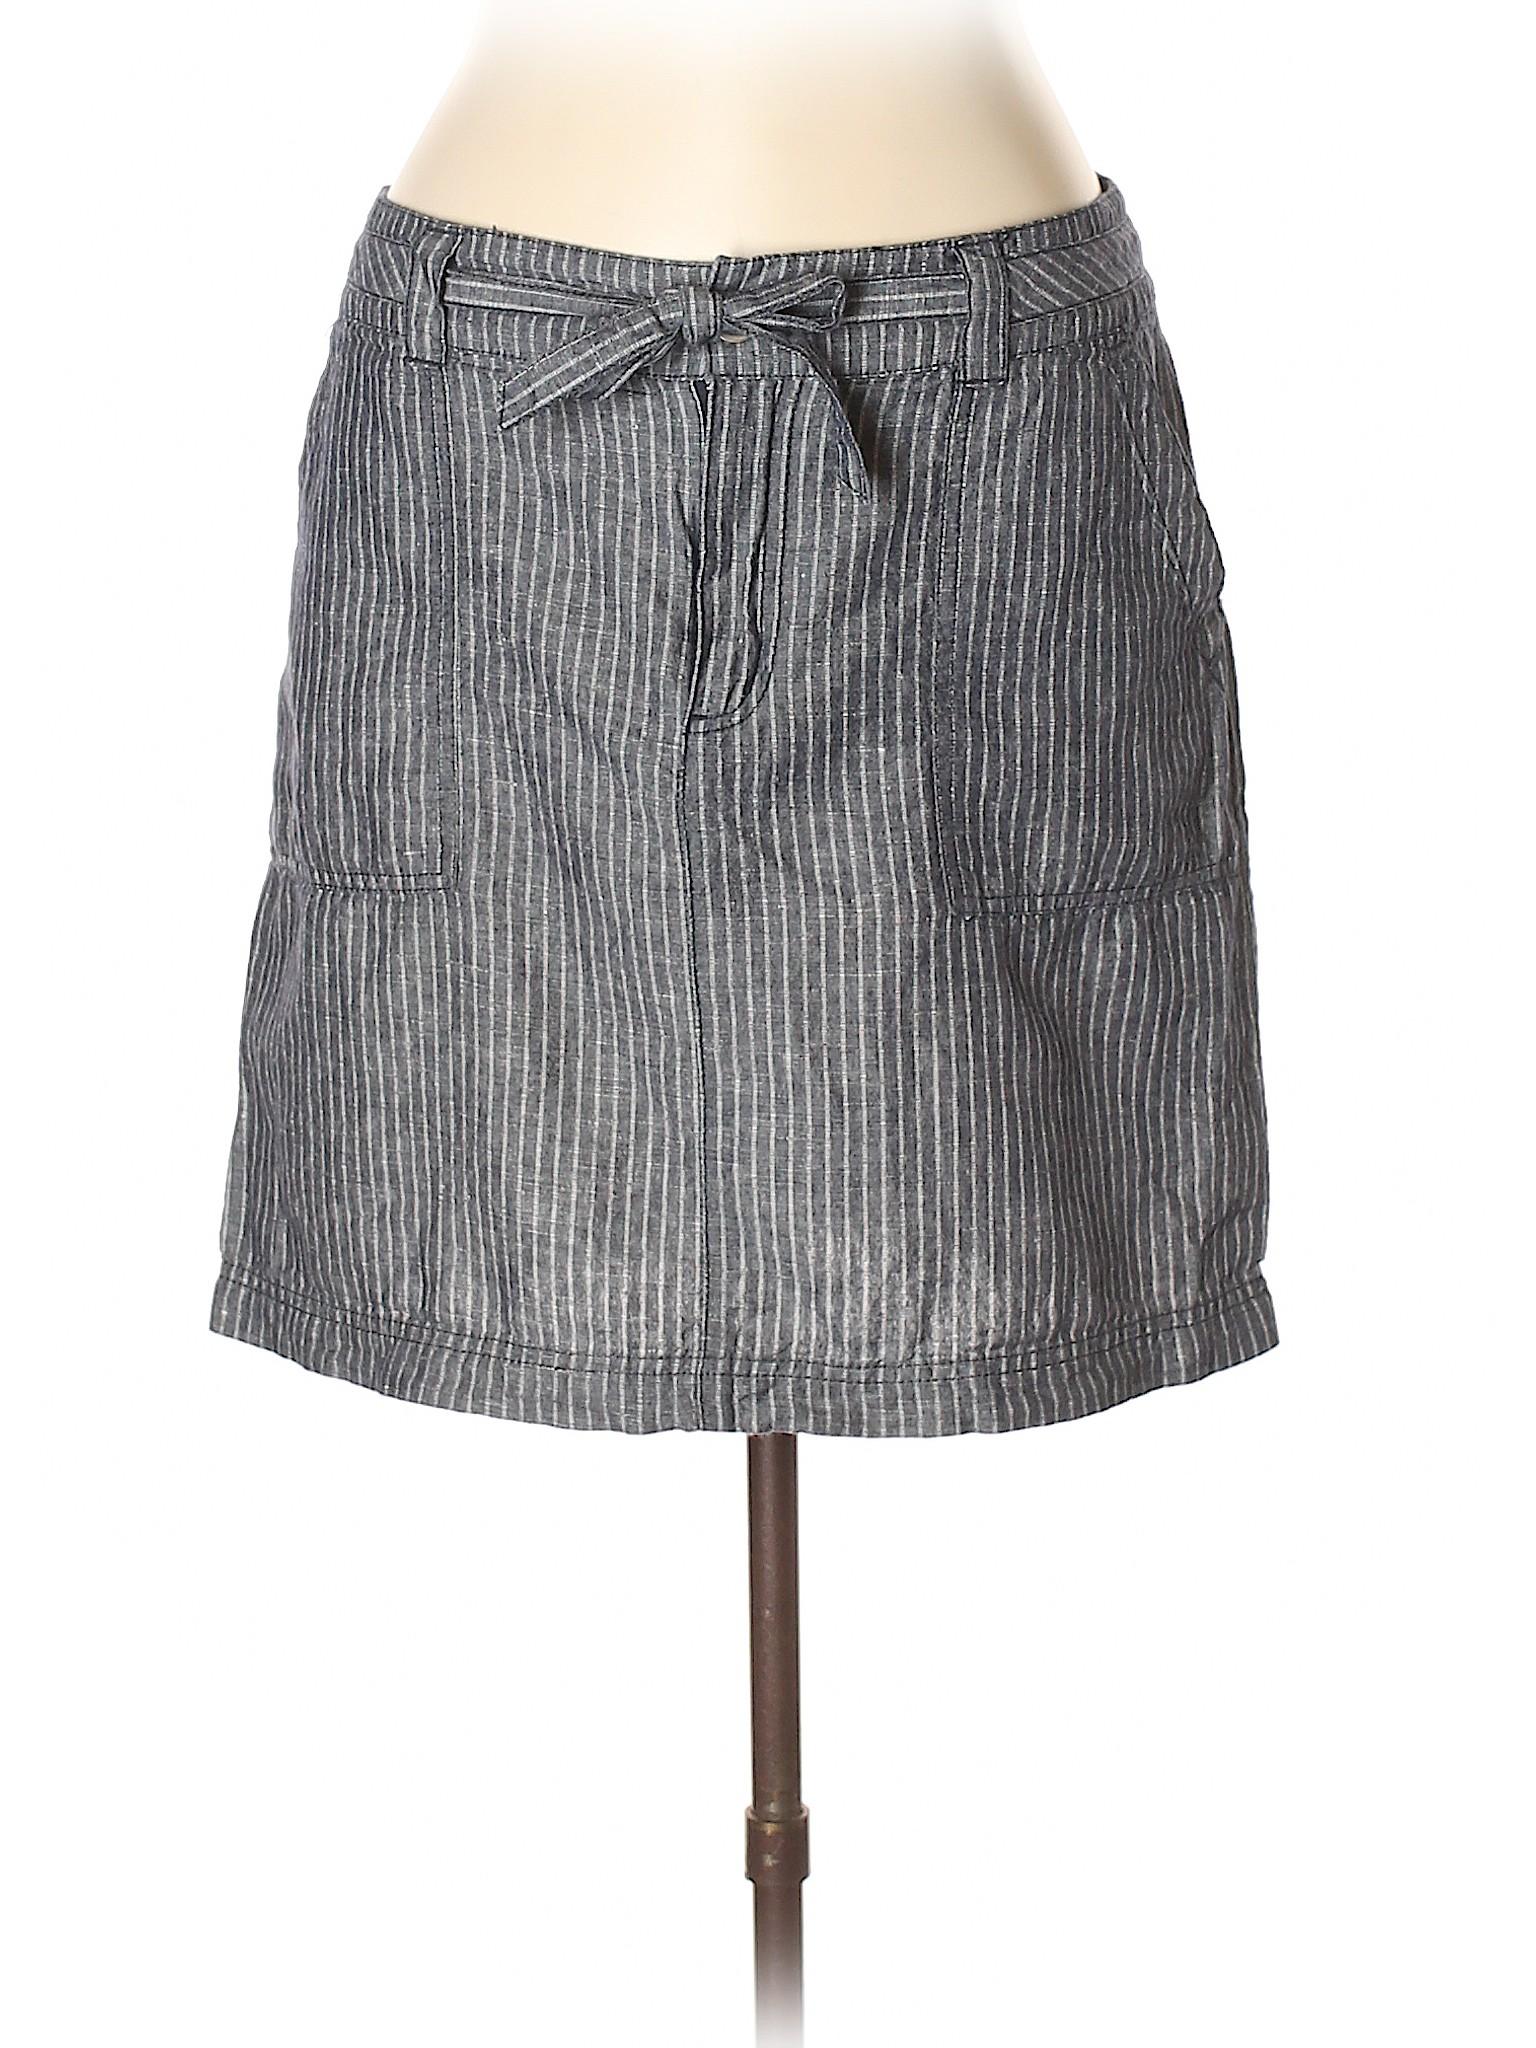 Merona Boutique Merona Skirt Casual Skirt Casual Merona Boutique Casual Boutique Skirt 8Iaxq